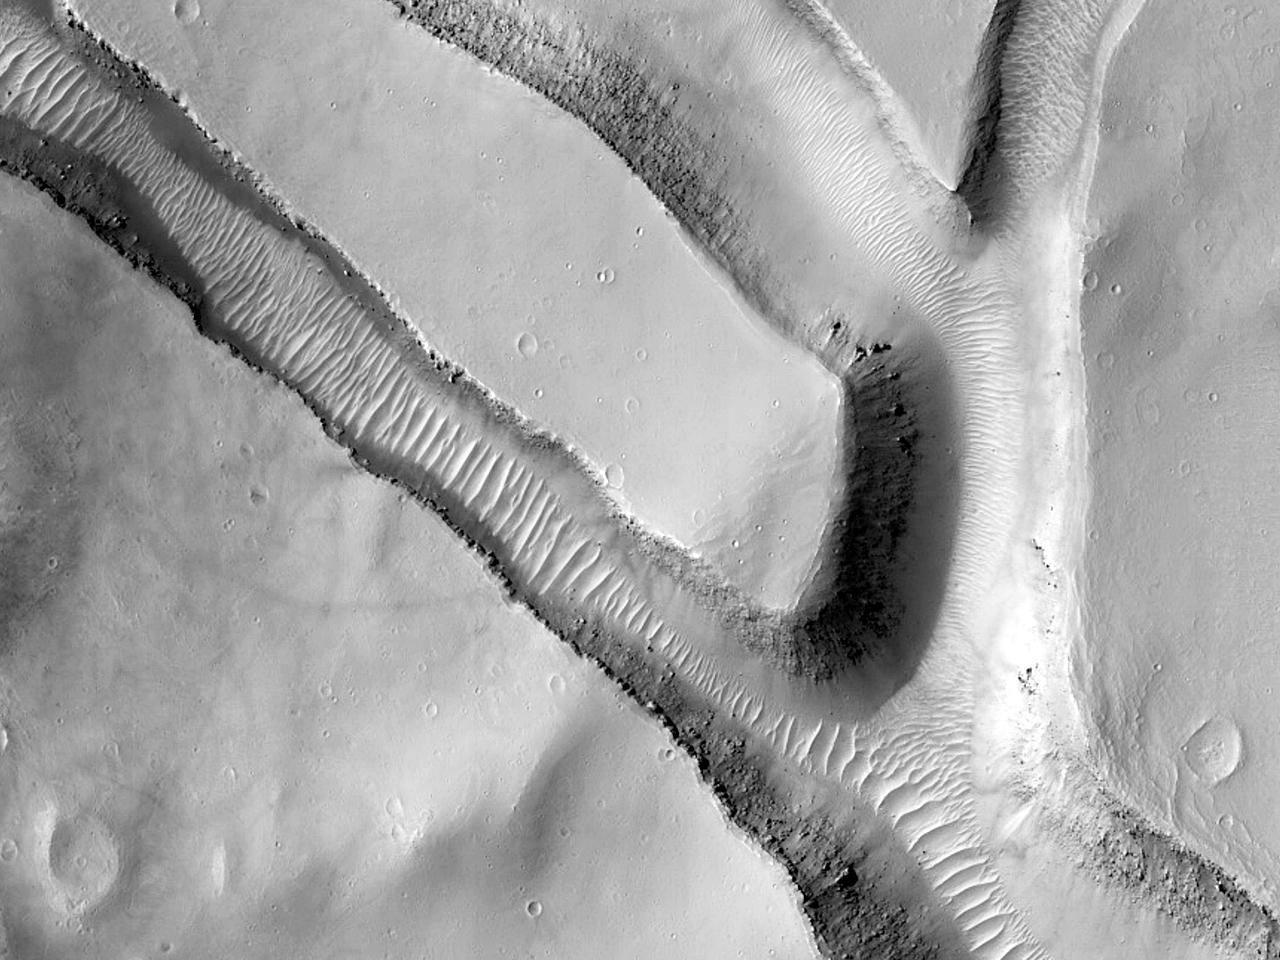 Trau i østlige Candor Chasma